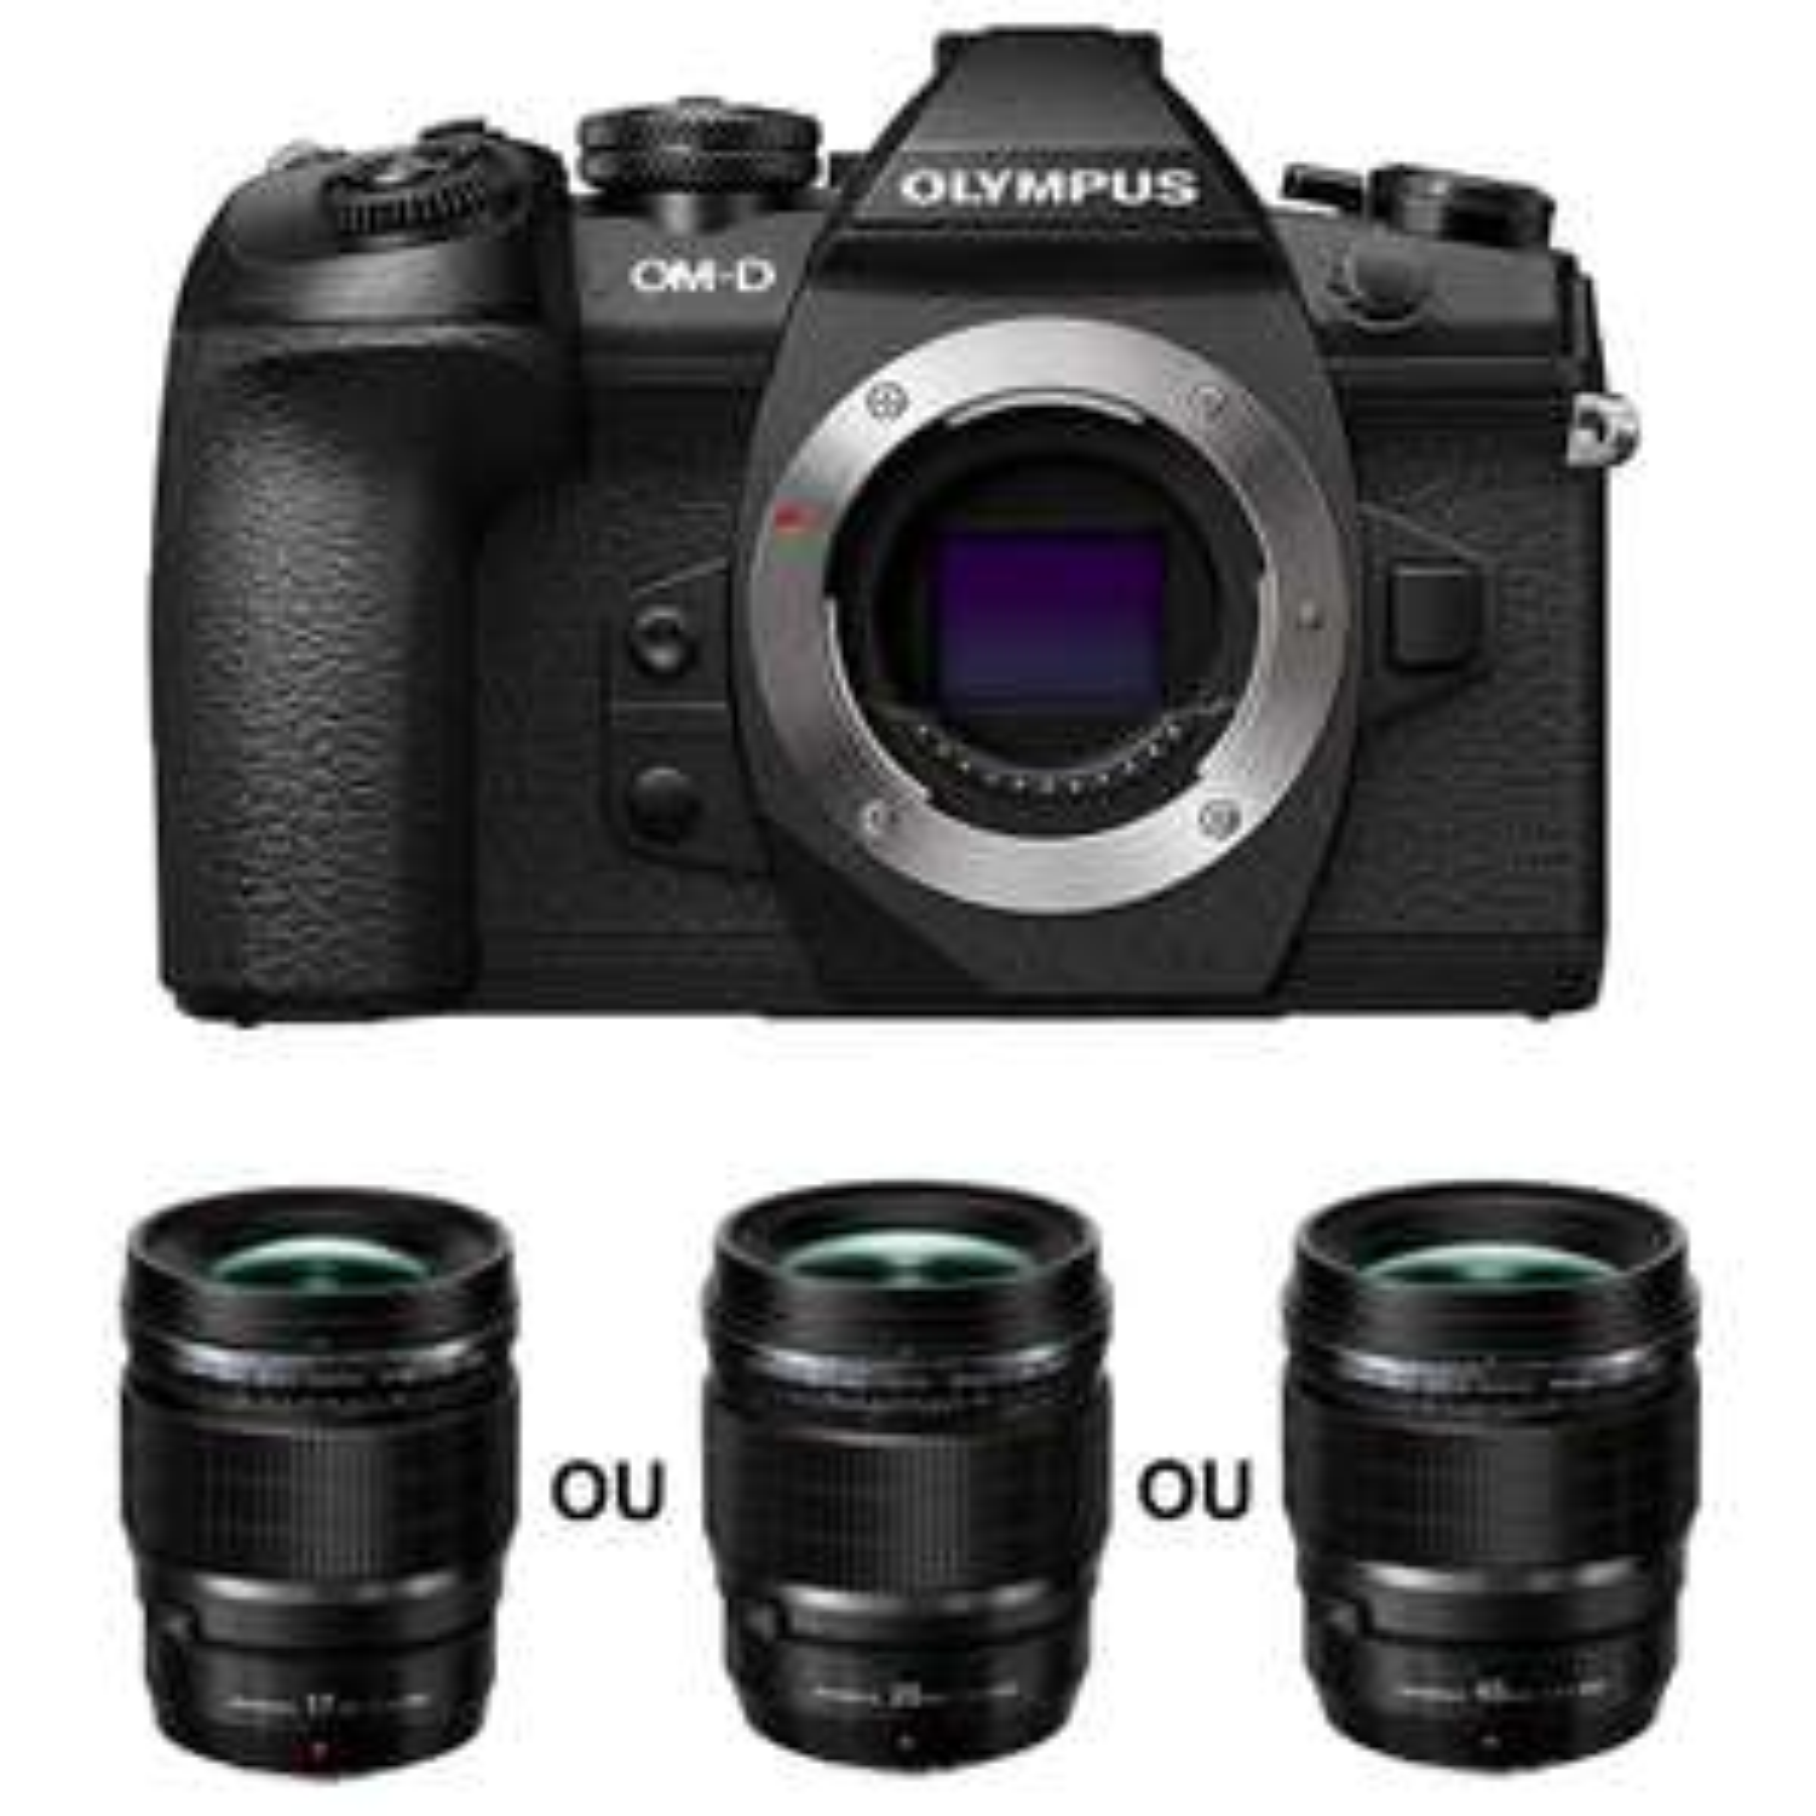 Appareil Photo Hybride Olympus OM-D E-M1 Mark II + Objectif M.Zuiko Digital ED f/1.2 Pro (17, 25 ou 45 mm) offert via formulaire